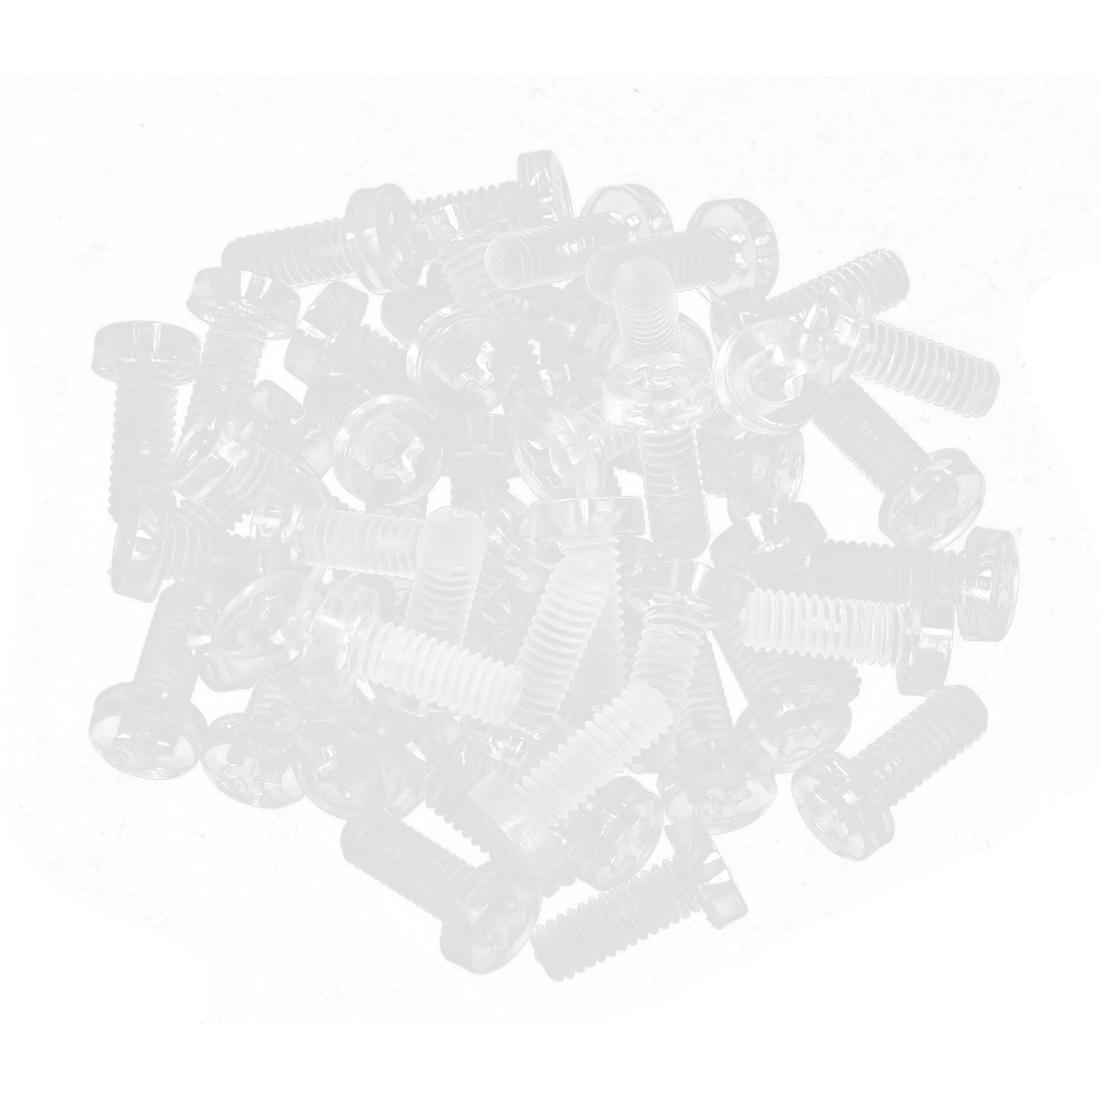 M4 x 12mm Clear Polycarbonate Round Head Cross Phillips Screws Bolt 50pcs